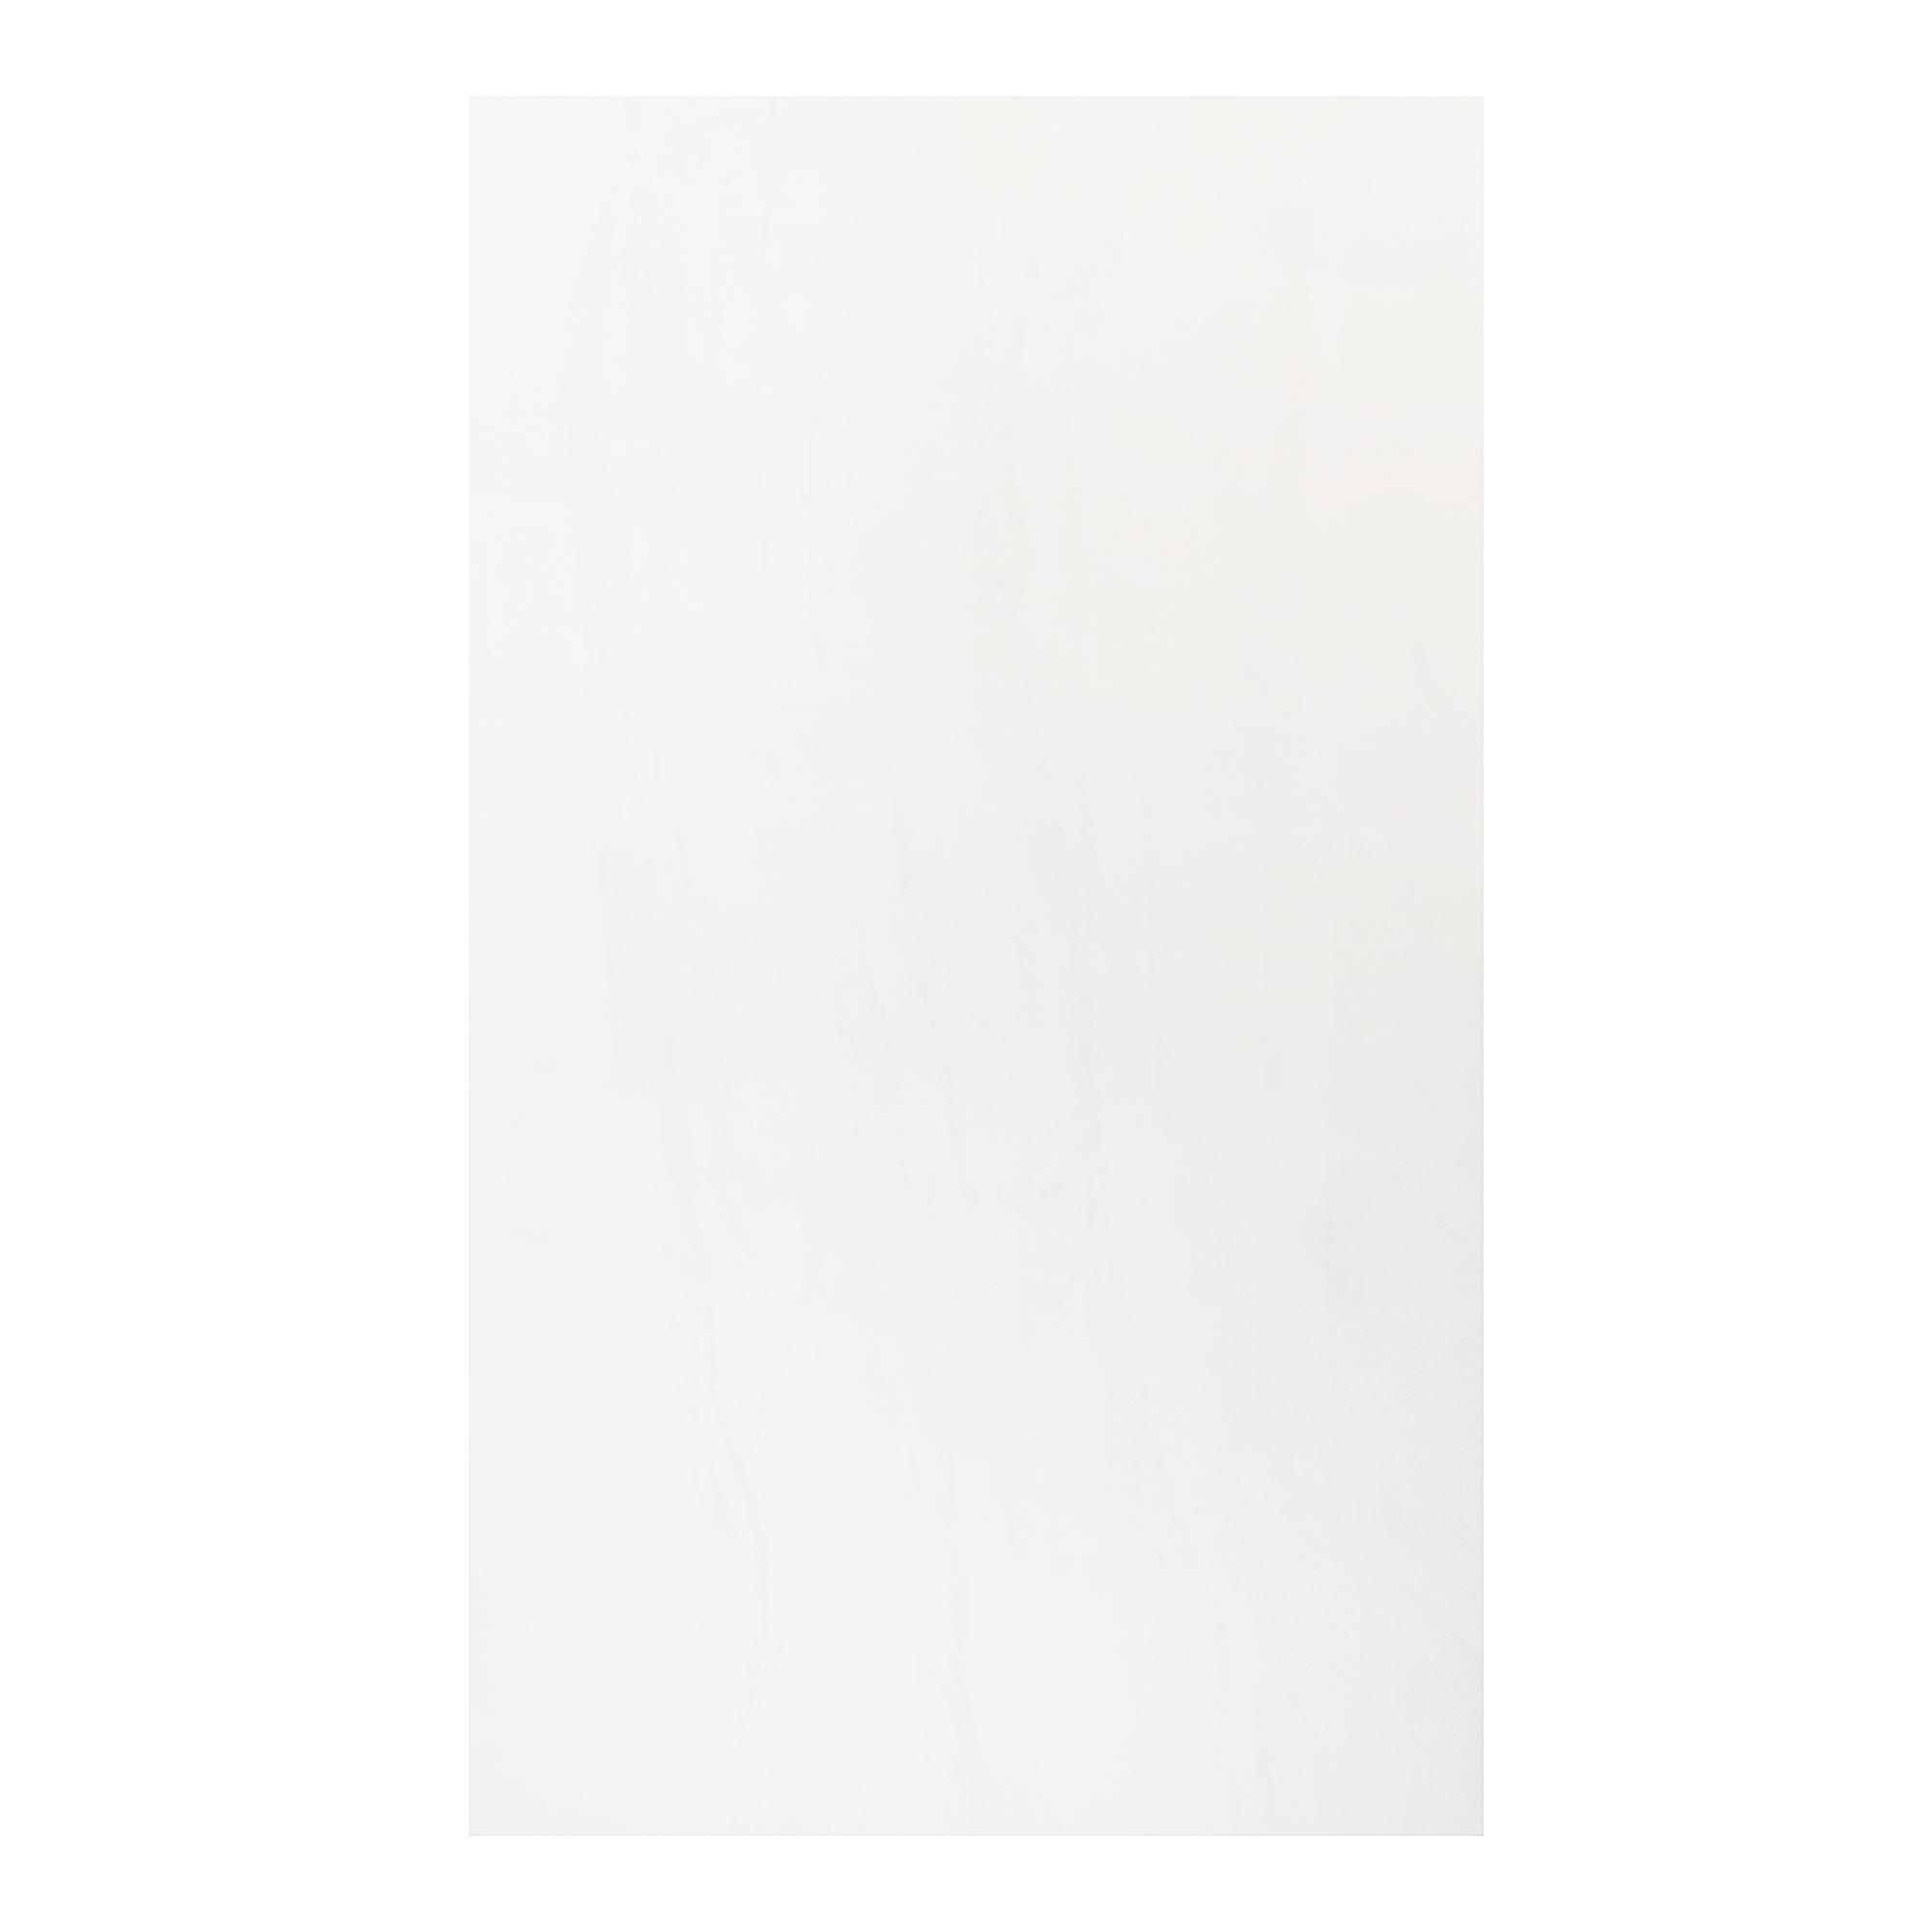 Фото - Плитка настенная/напольная Cristacer dolomite white 60х120 плитка напольная cristacer avenue grey gr 59 2х59 2